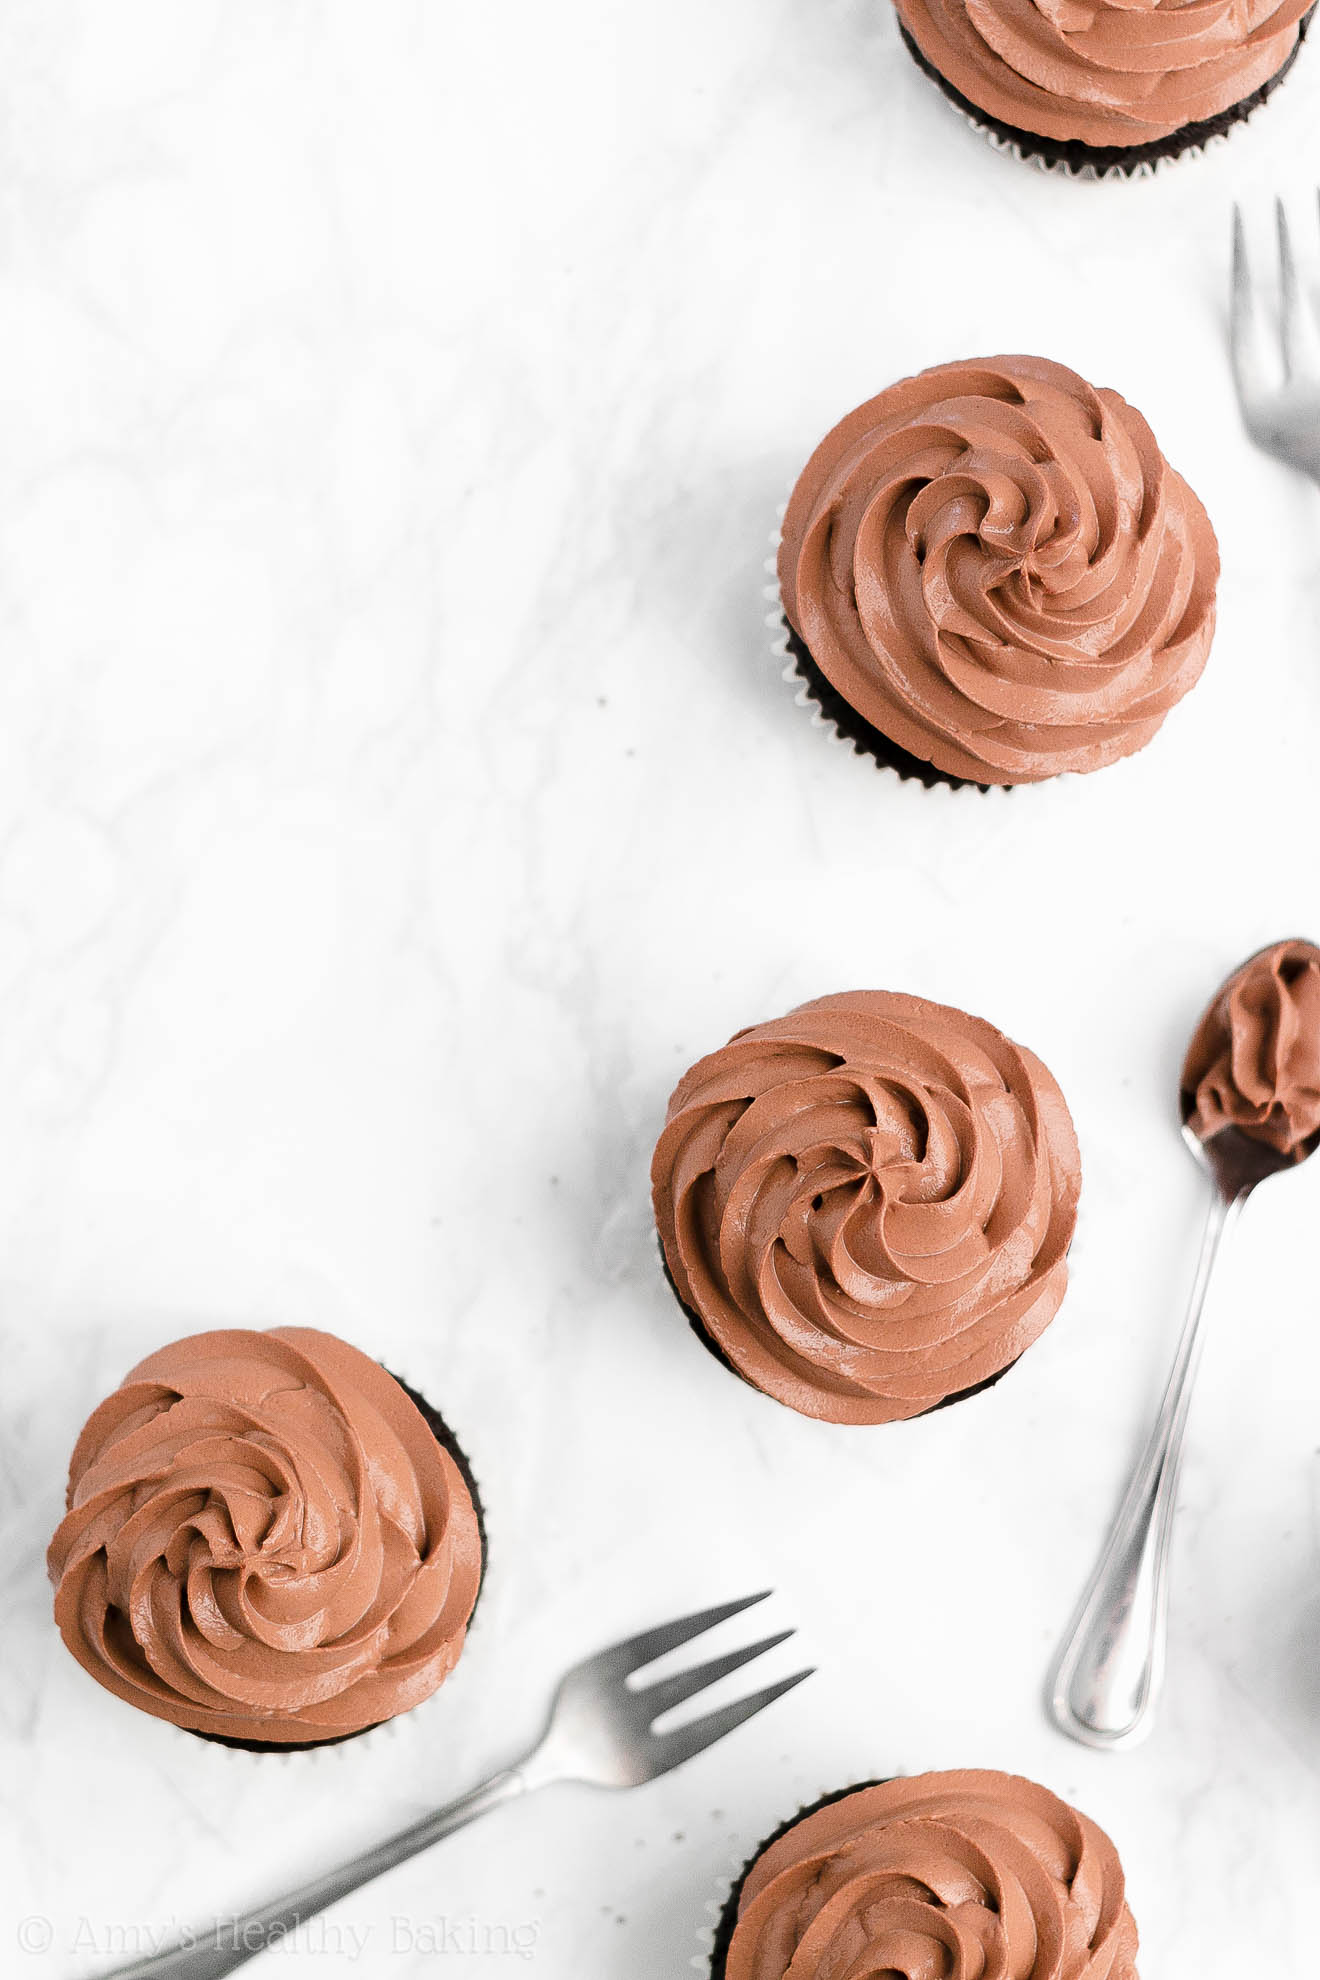 Best Easy Healthy One-Bowl Chocolate Cupcakes with Greek Yogurt Frosting